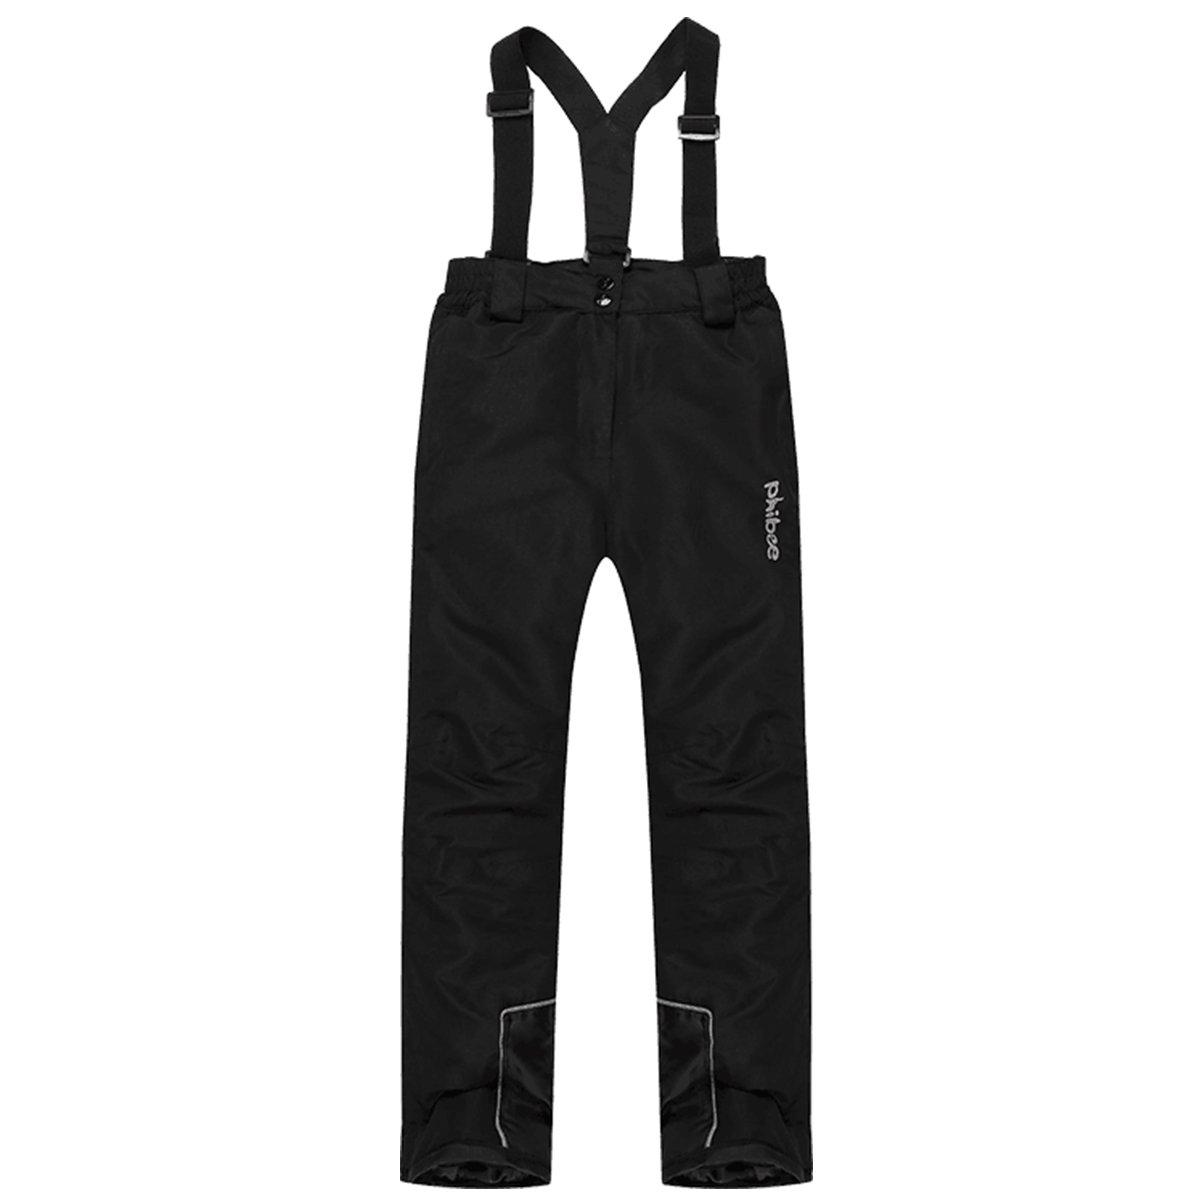 Phibee Cheap Girls Ski Pants Under ($100)